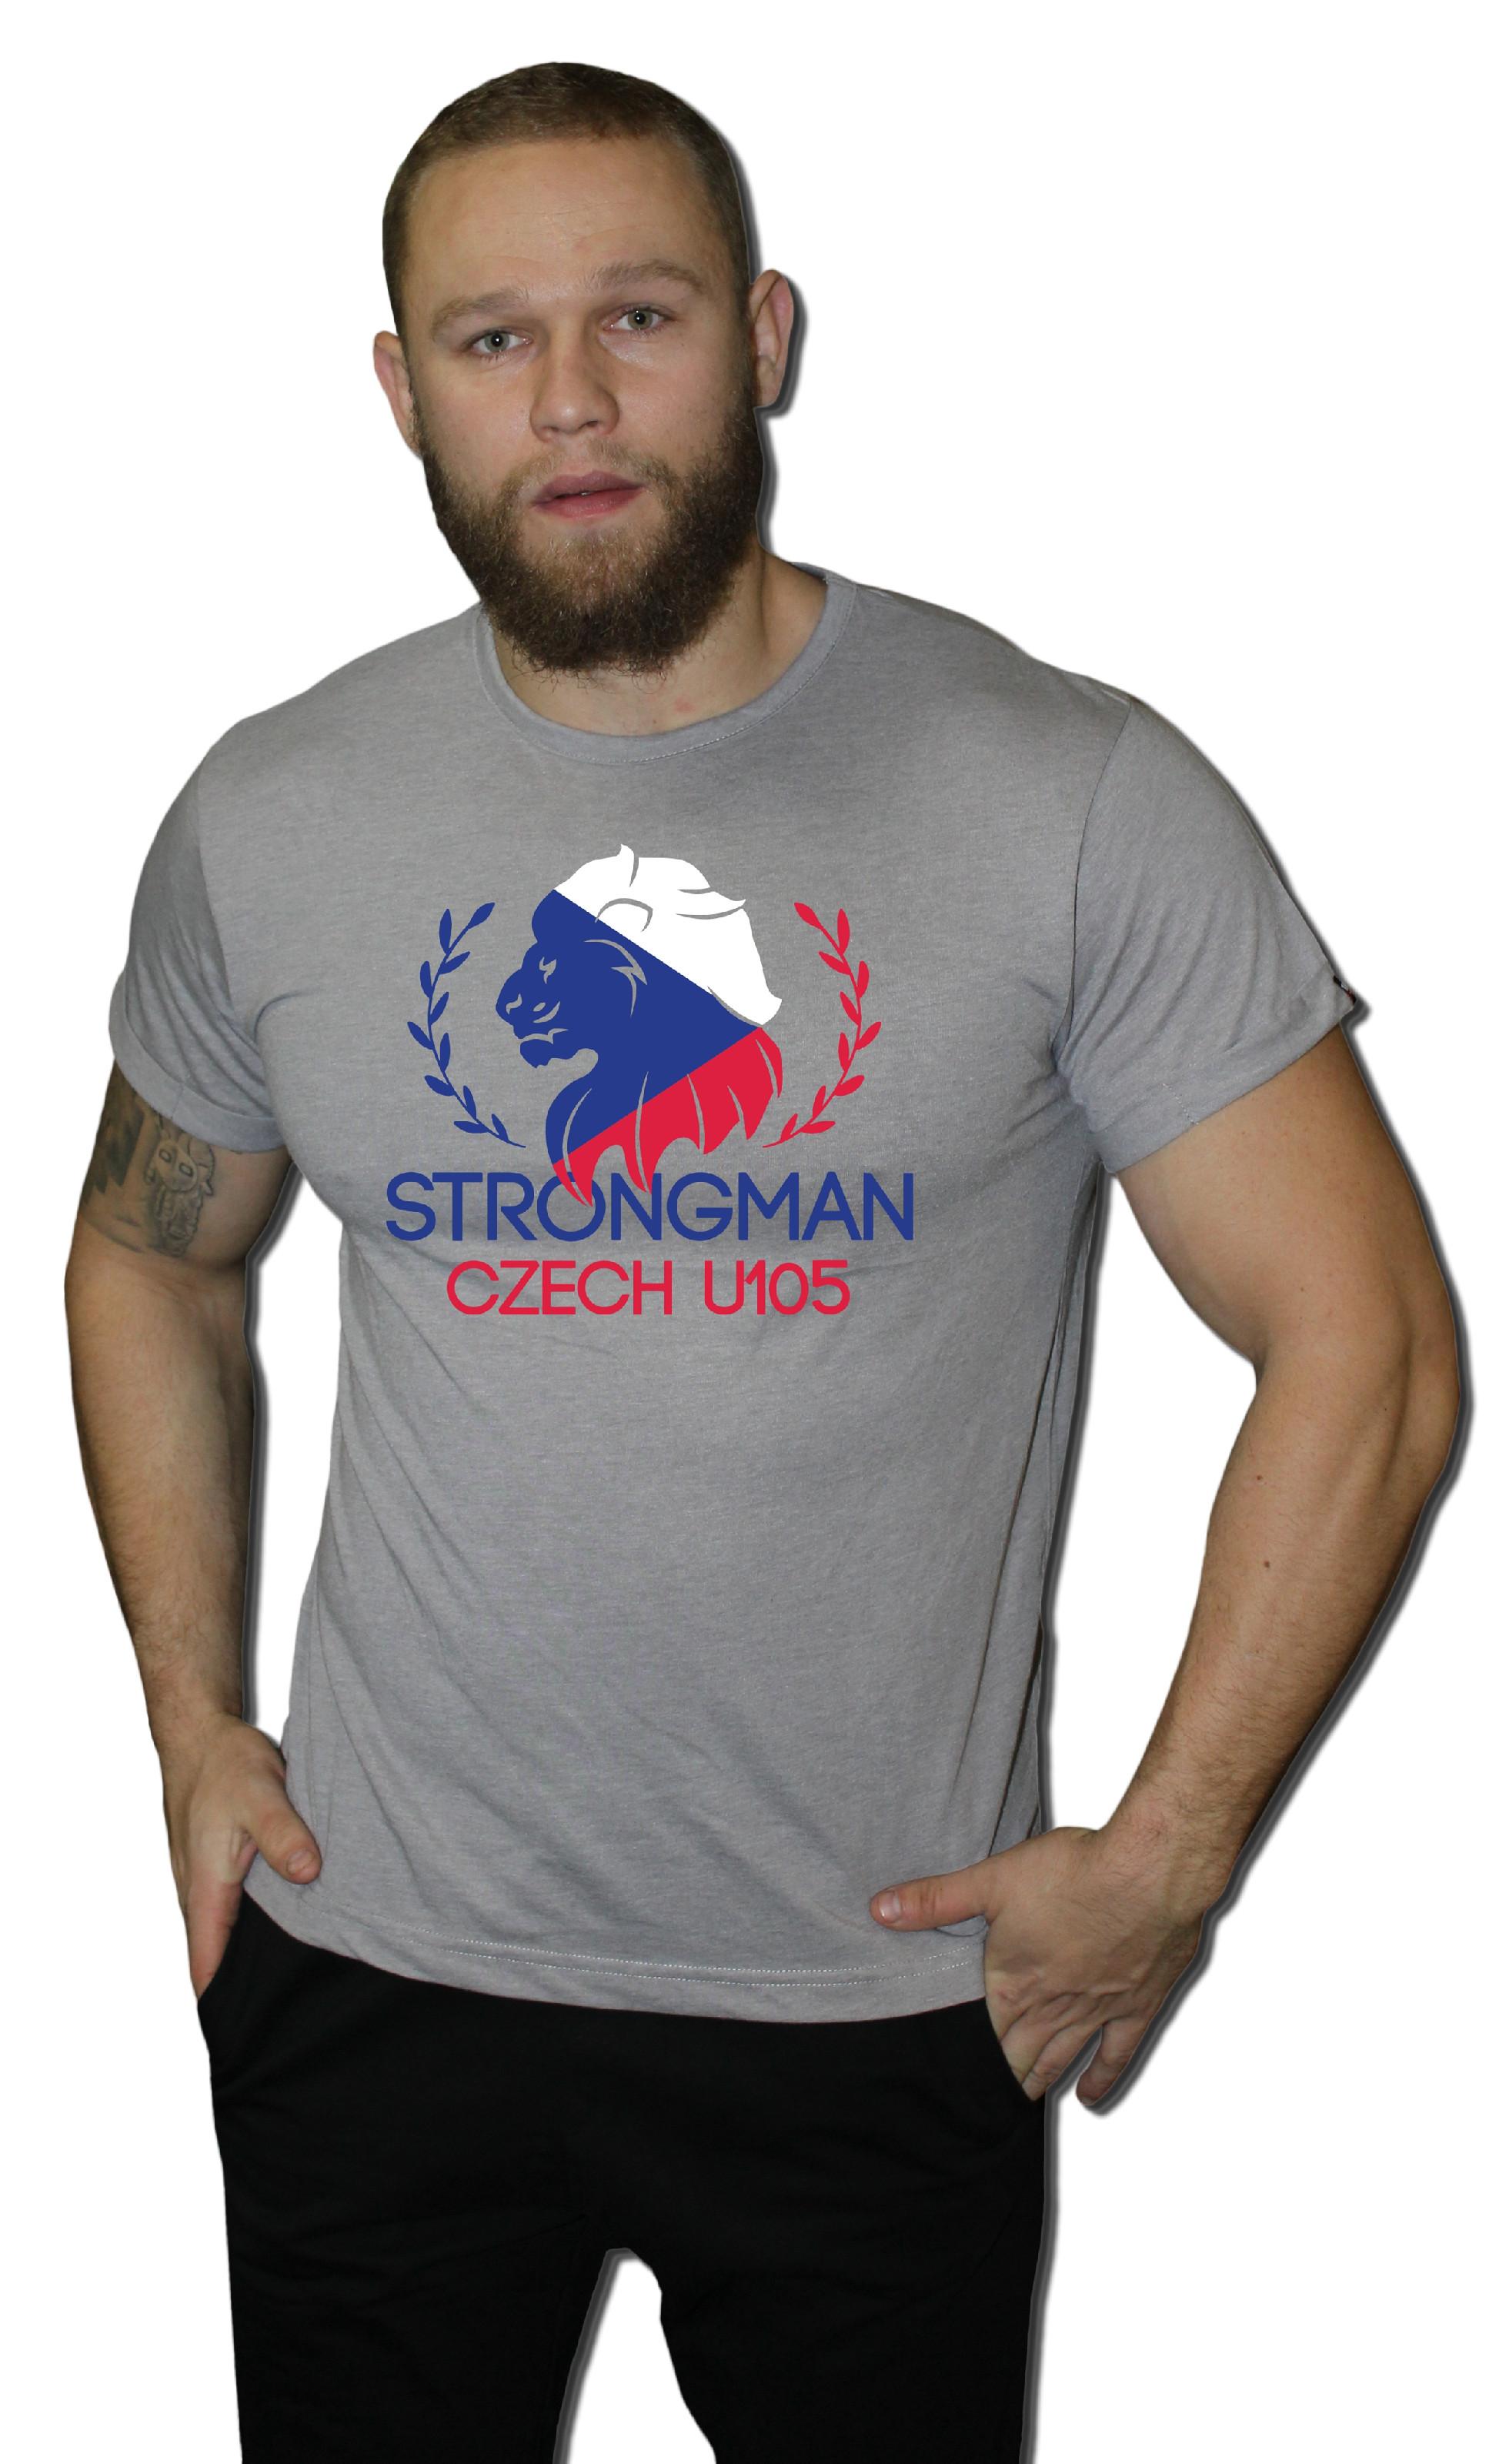 Strongman Czech U105